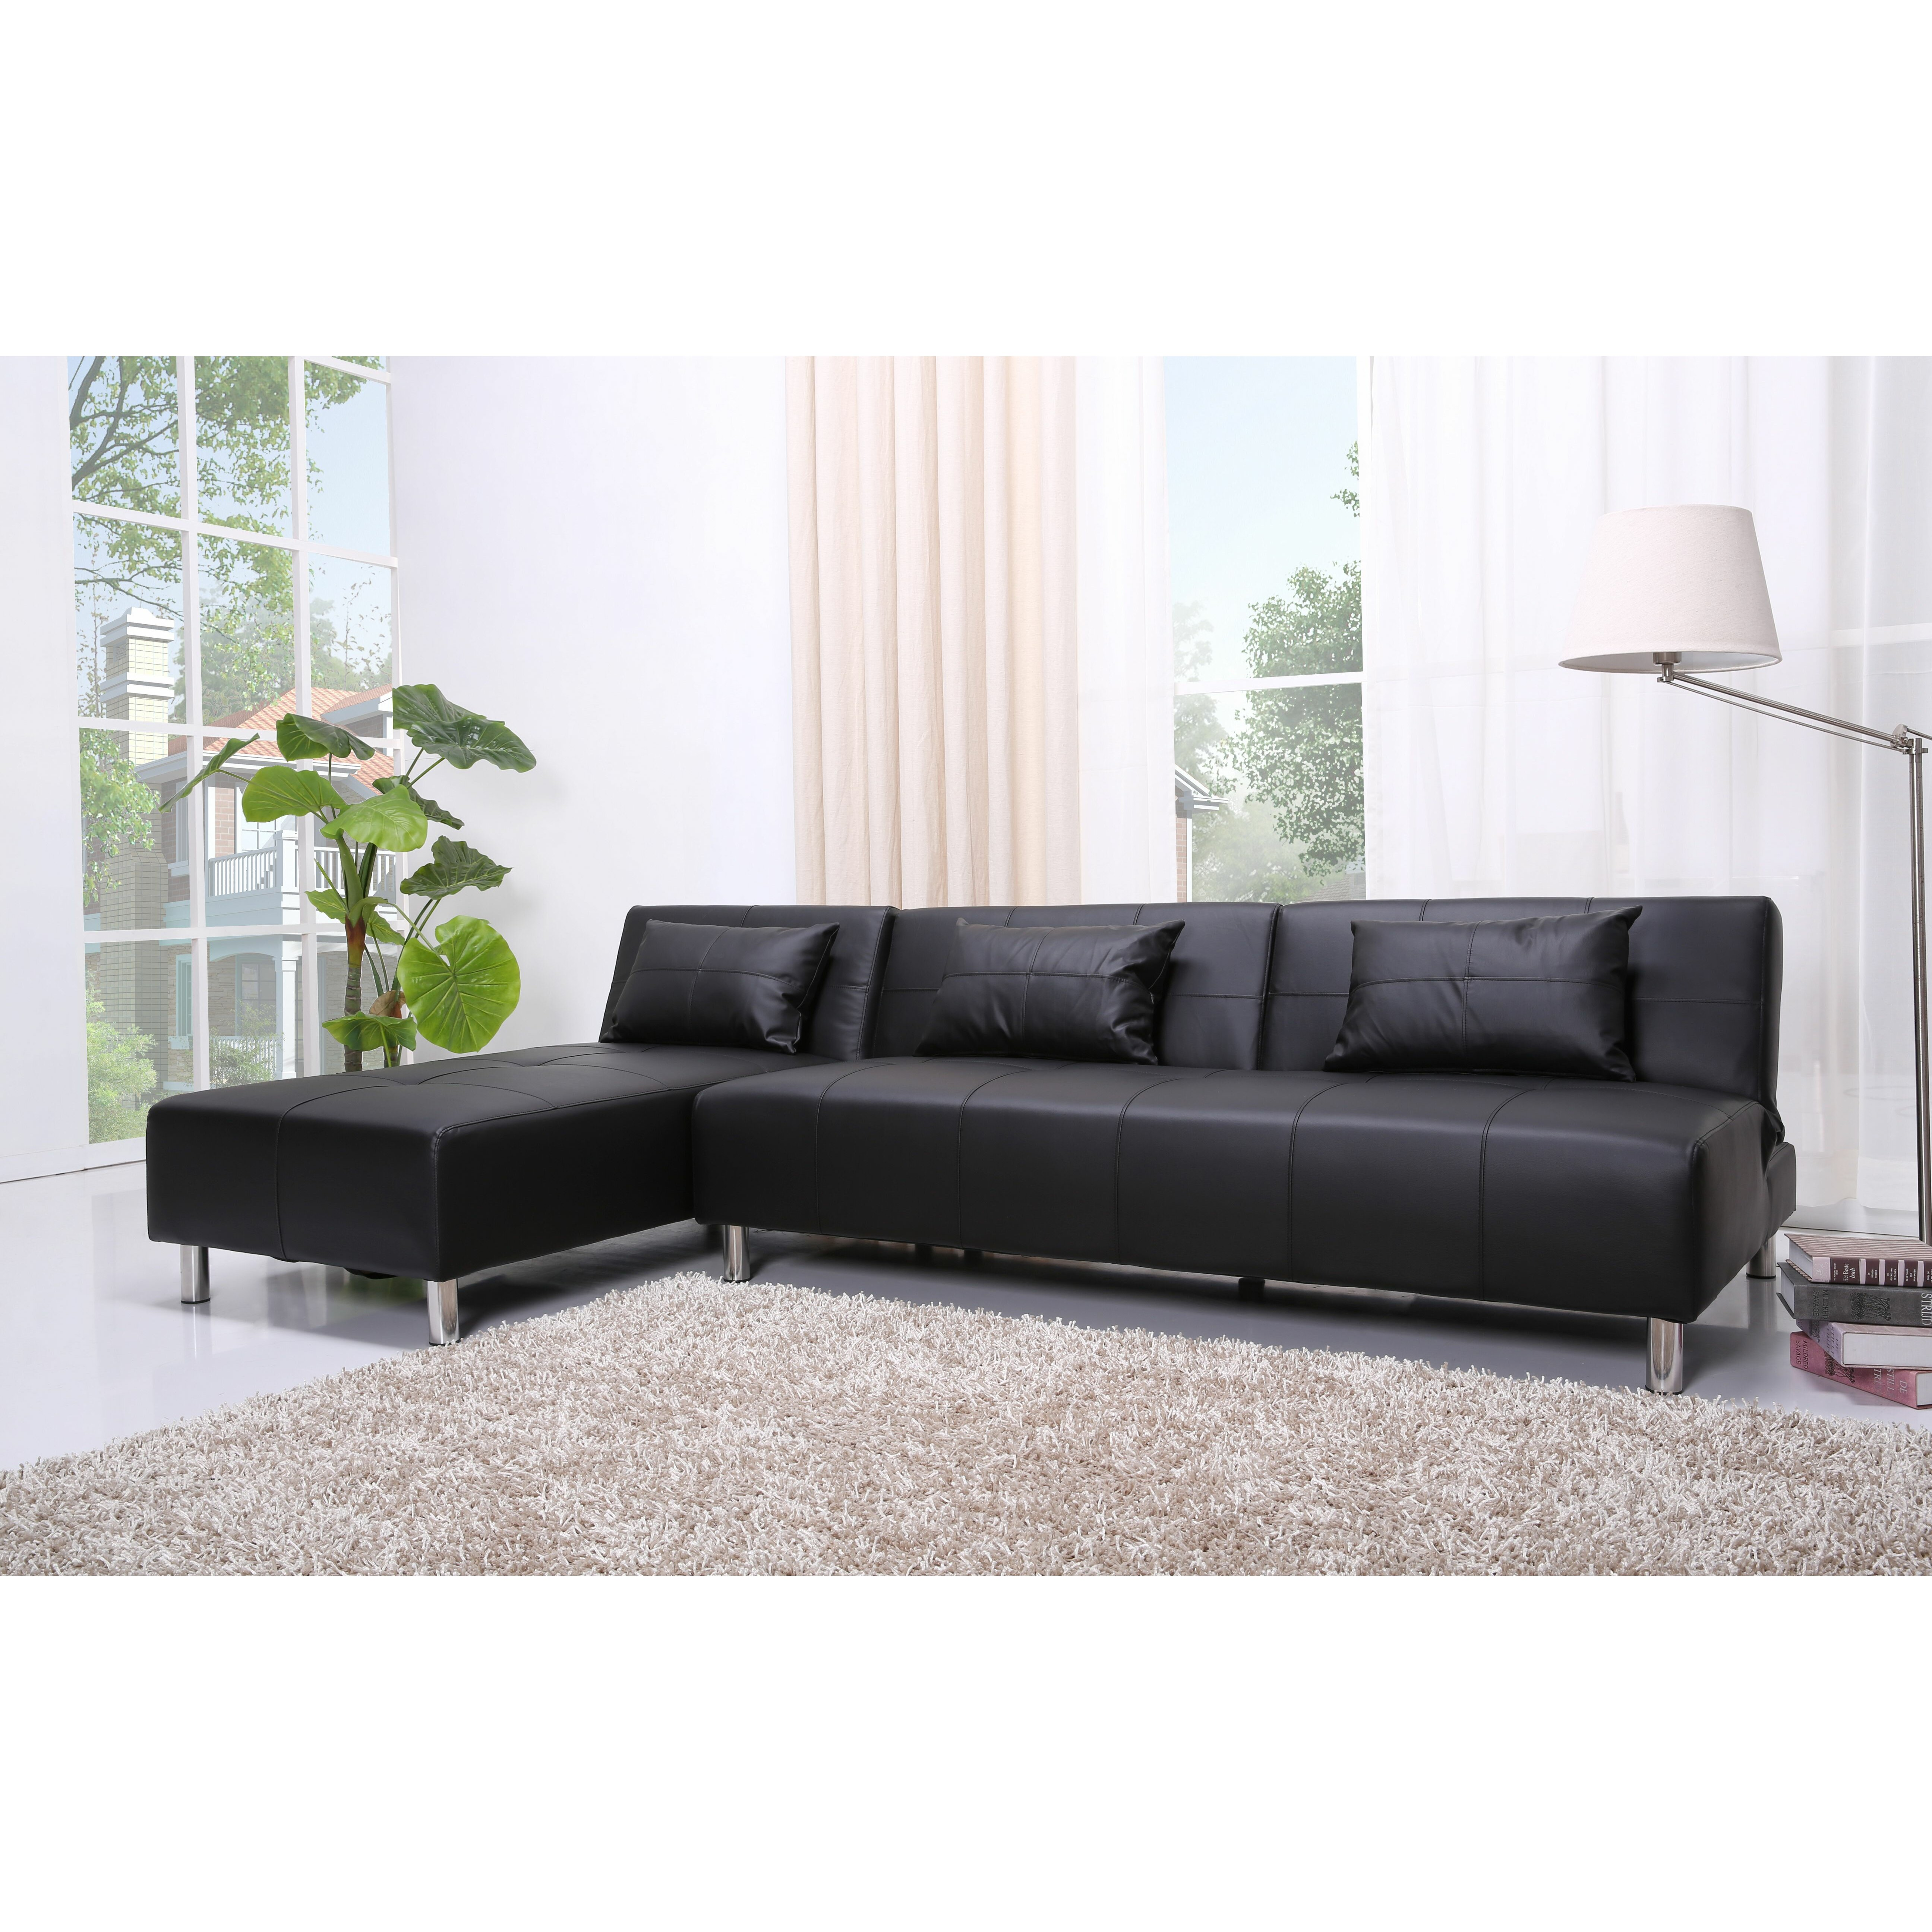 4 Seat Sofa Bed – Hereo Sofa